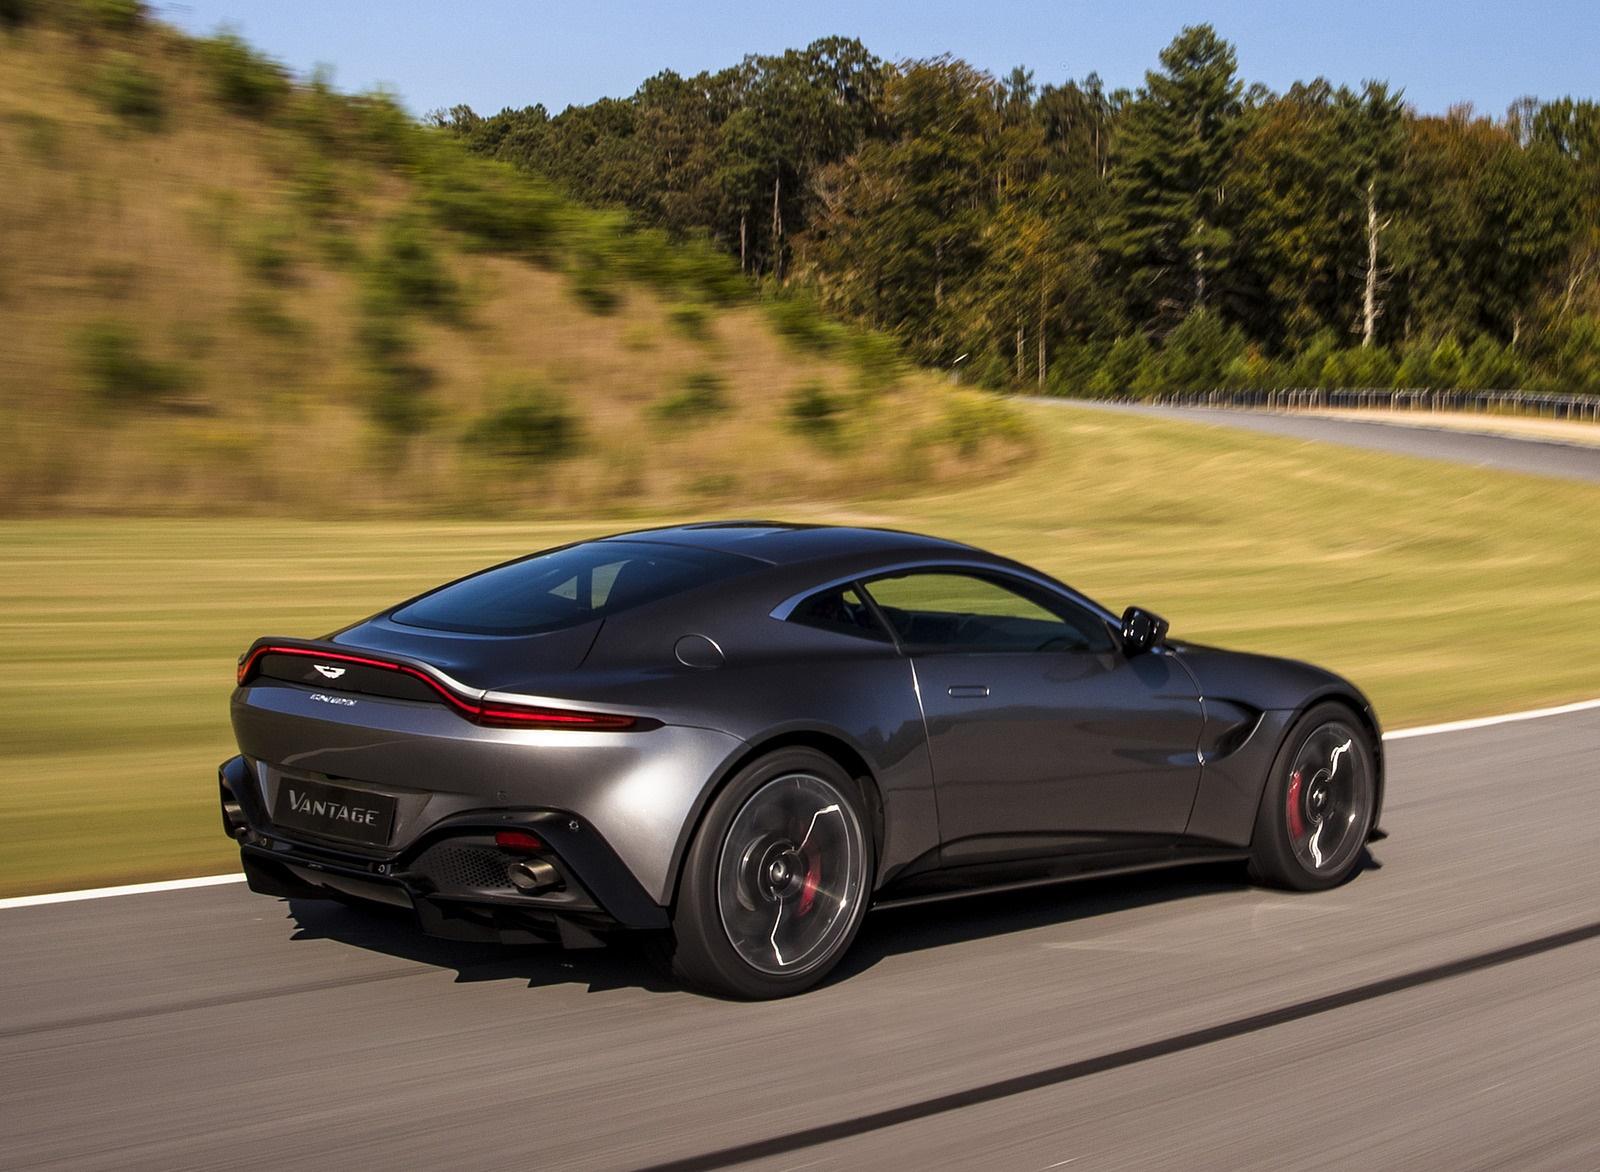 2019 Aston Martin Vantage Rear Three Quarter Wallpapers 31 Newcarcars